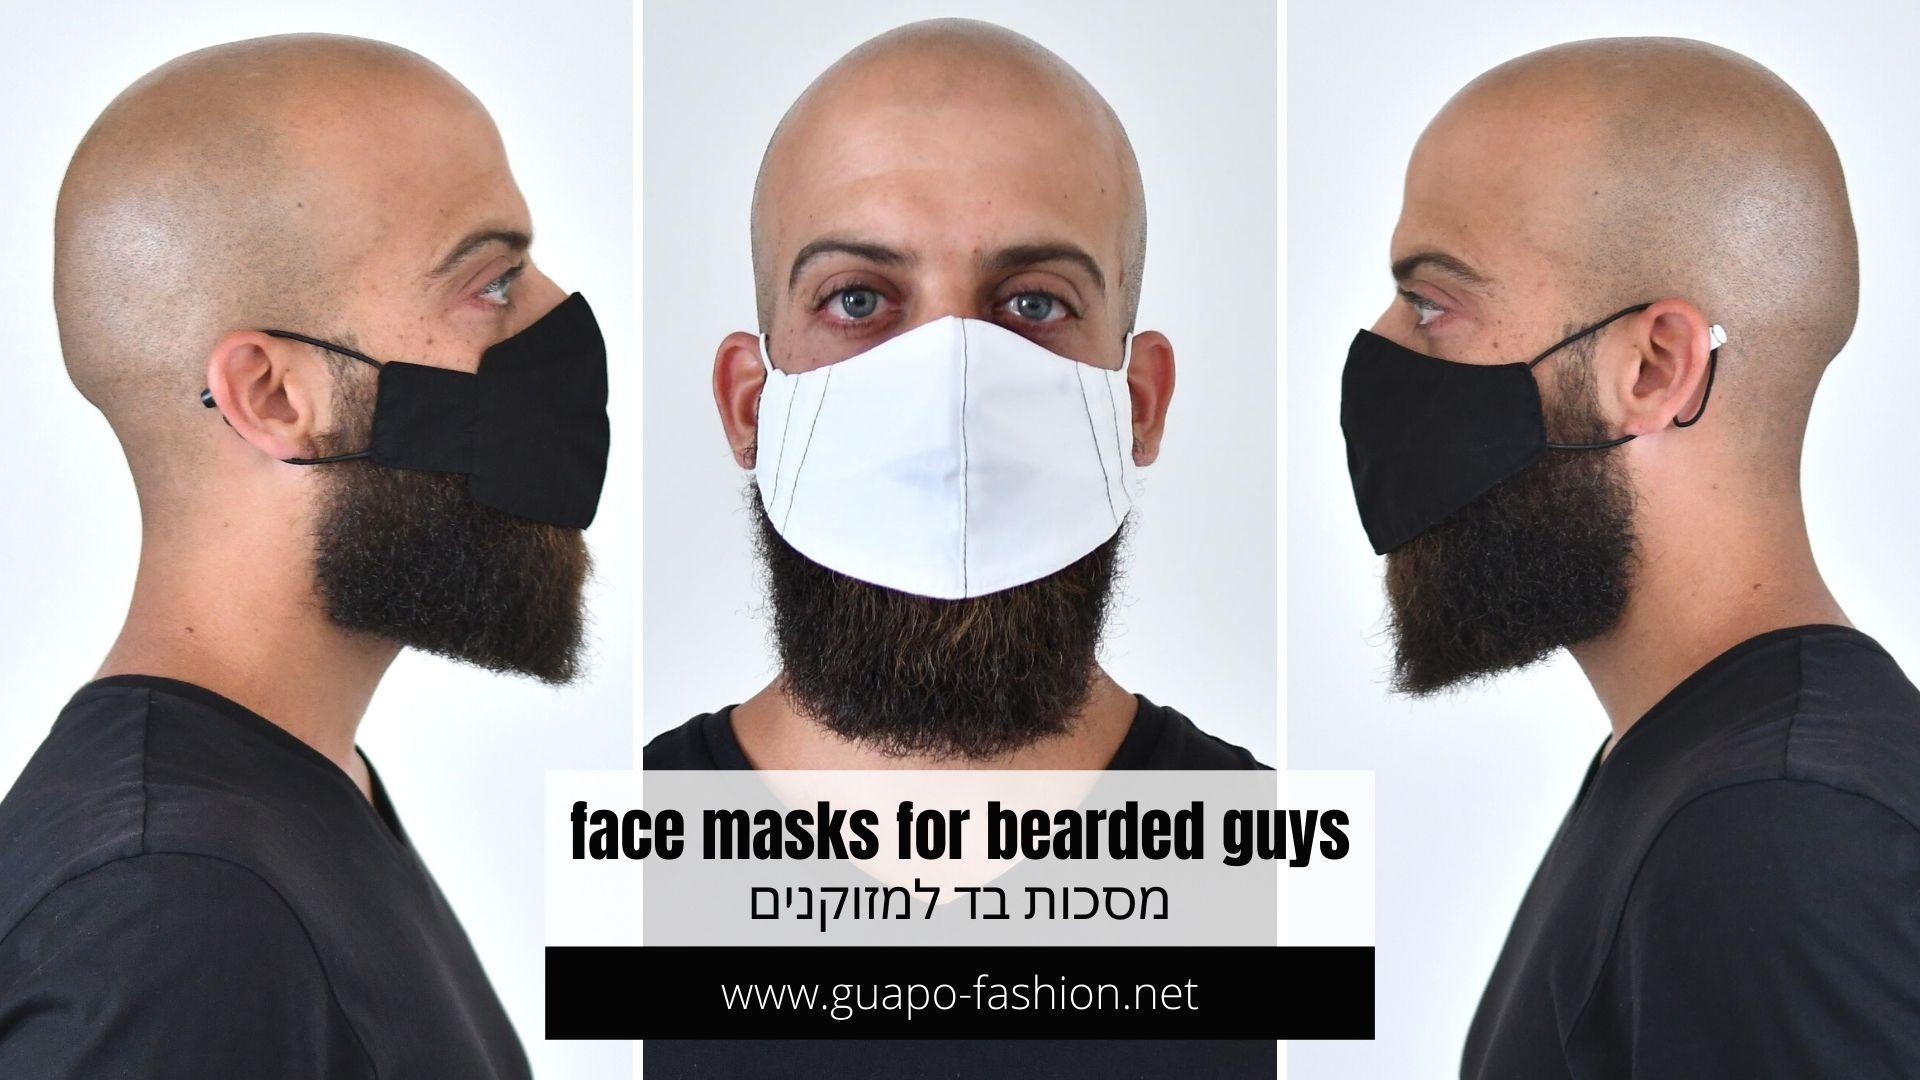 face masks for bearded guys - guapo fashion